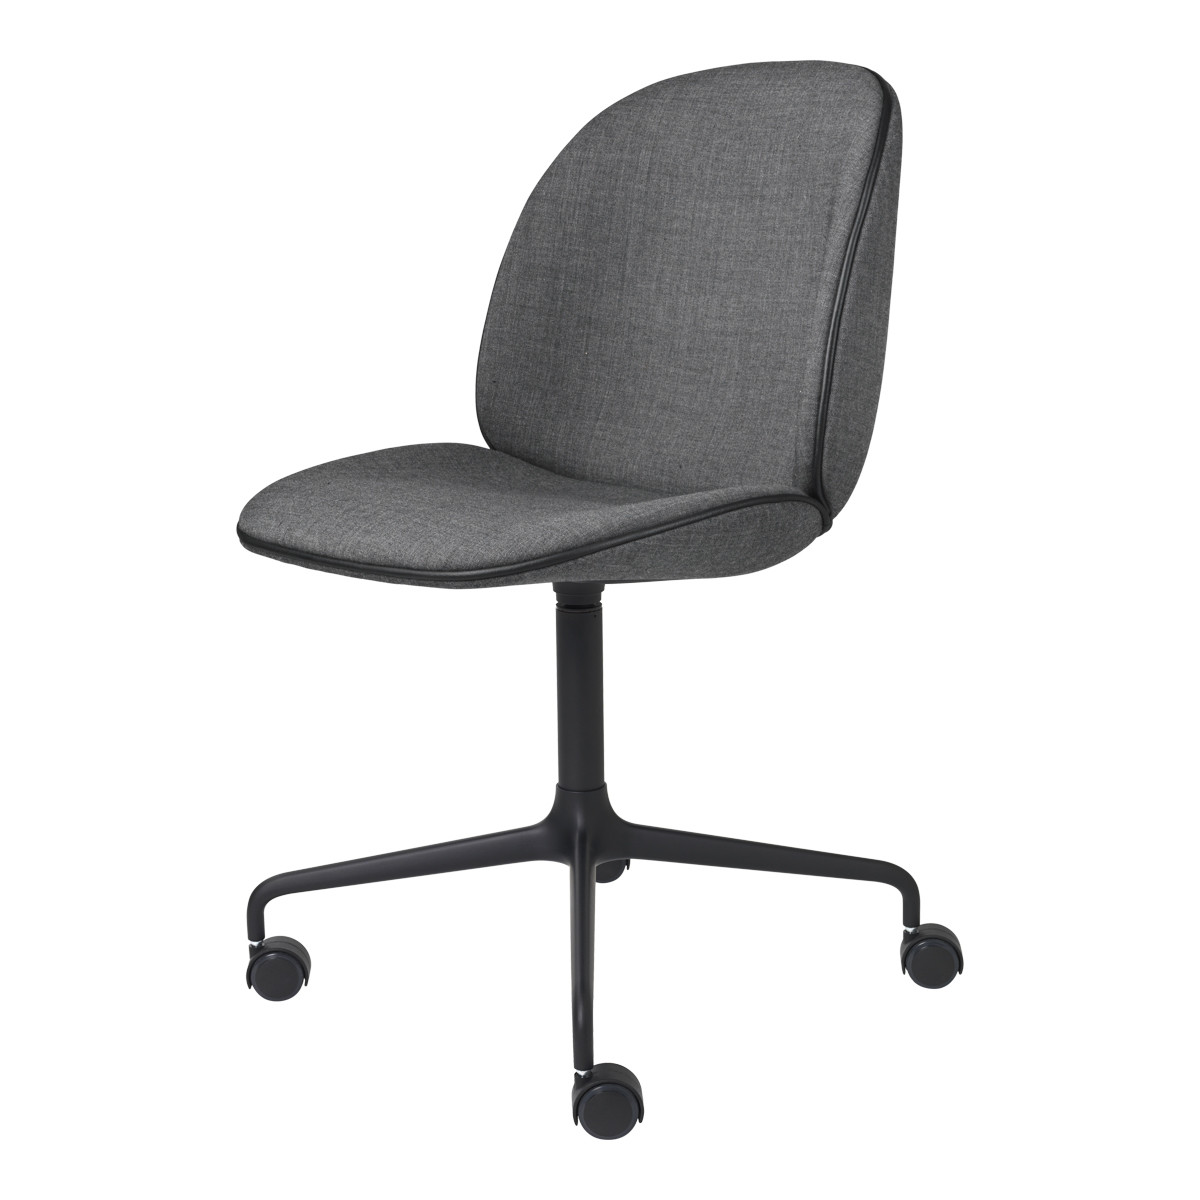 Gubi Beetle Meeting Chair - 4-Star Base W/ Castors